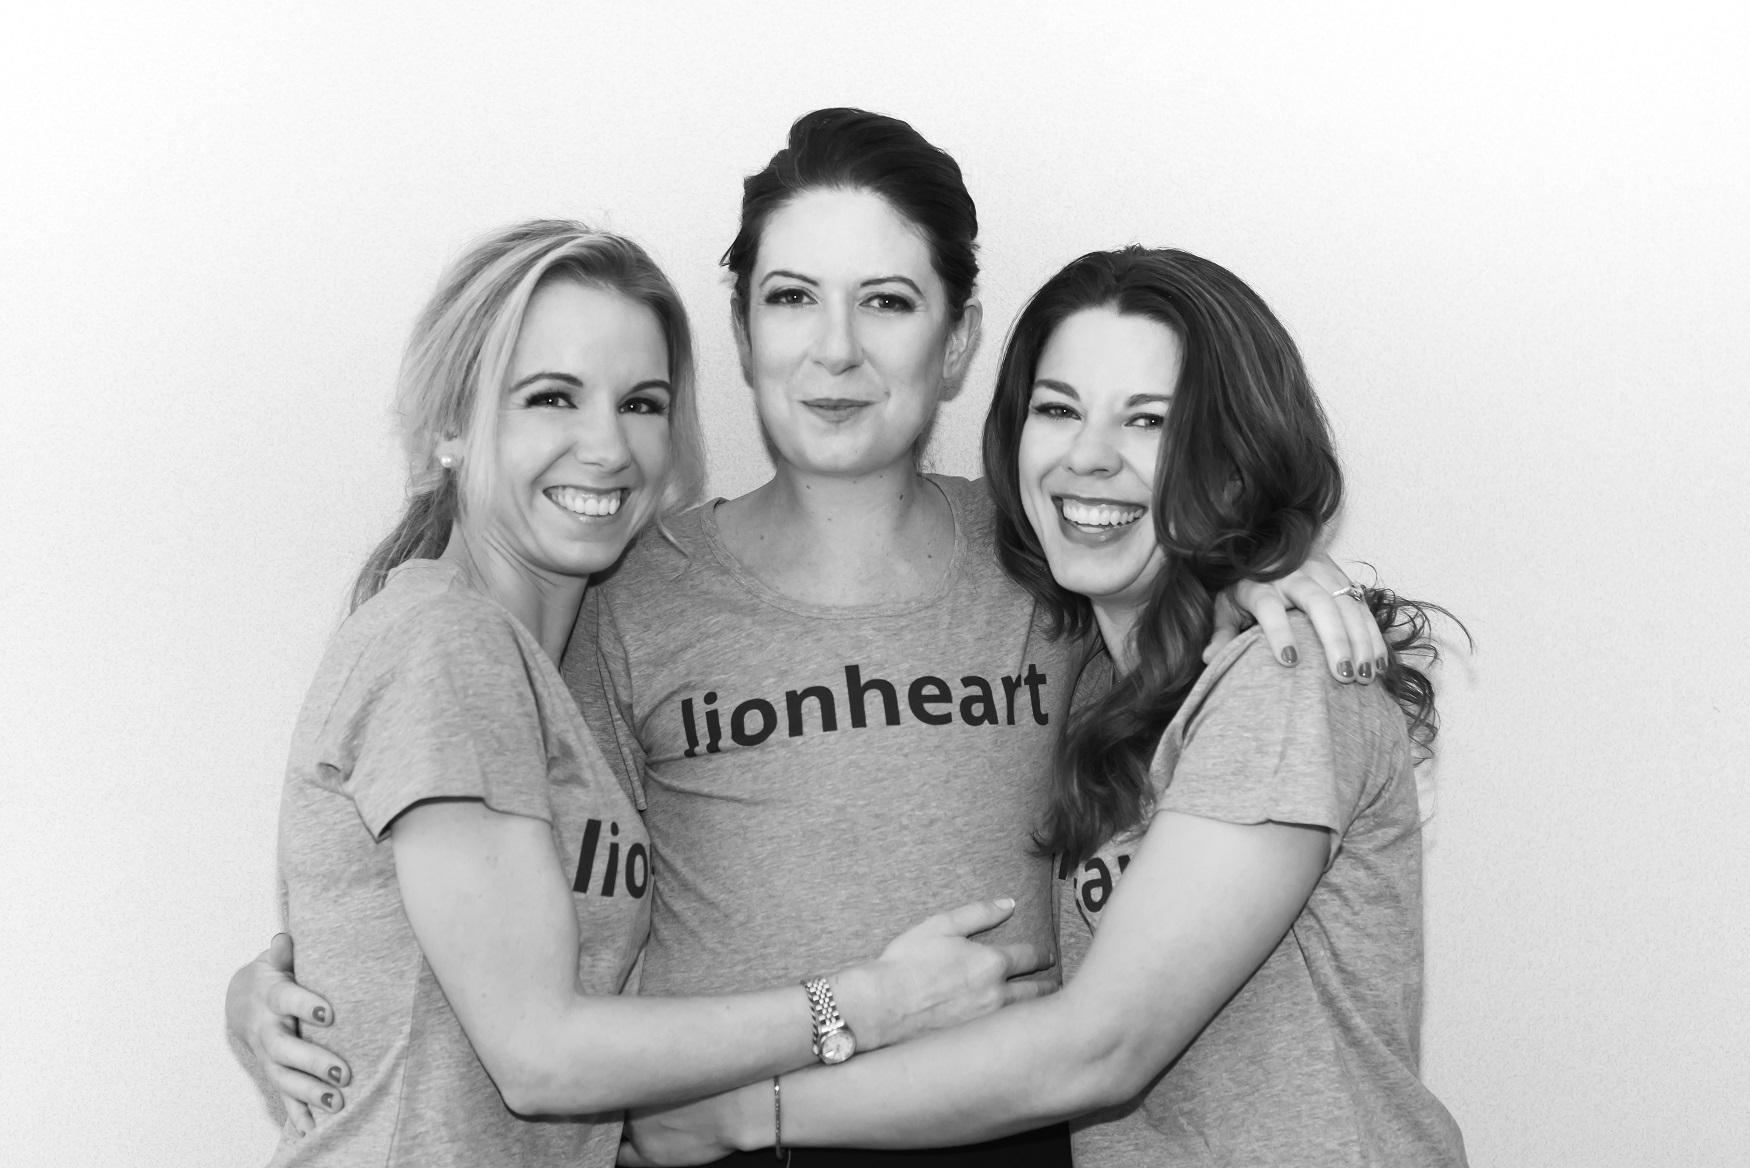 L - R Selina Smyth, Jodie Hampshire, Tammie Flinos